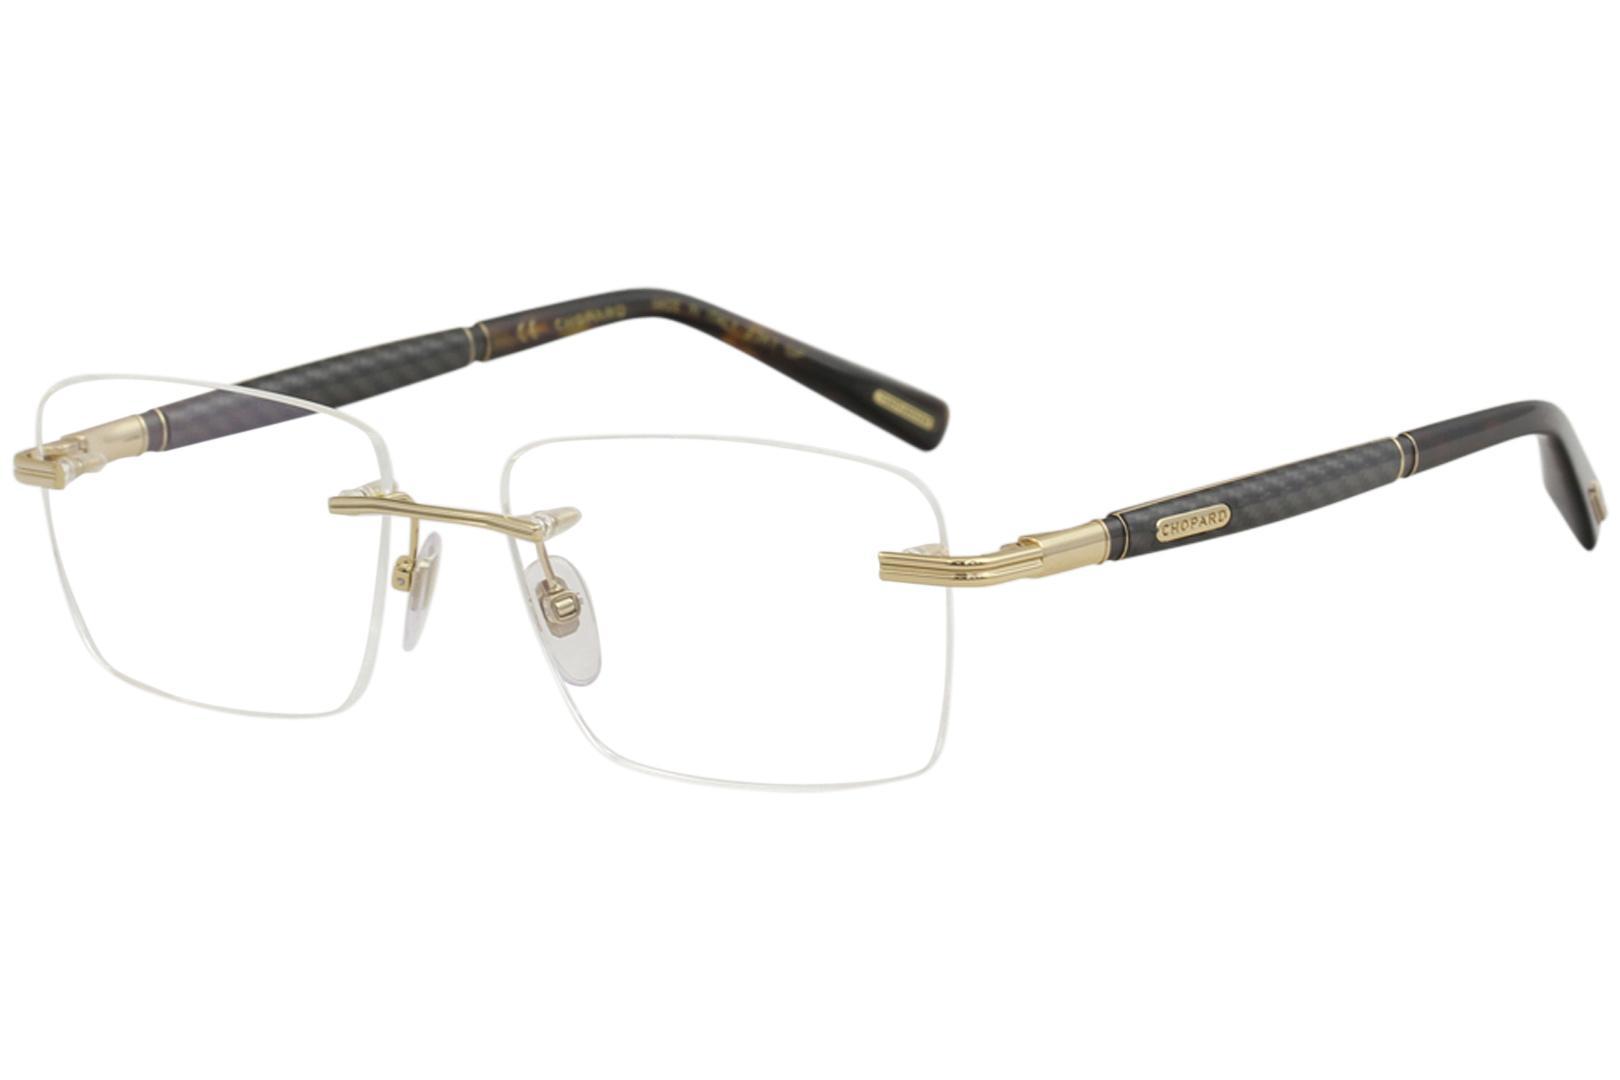 Chopard Eyeglasses VCHC37 VCHC/37 23K Gold/Havana Rimless Optical Frame 56mm